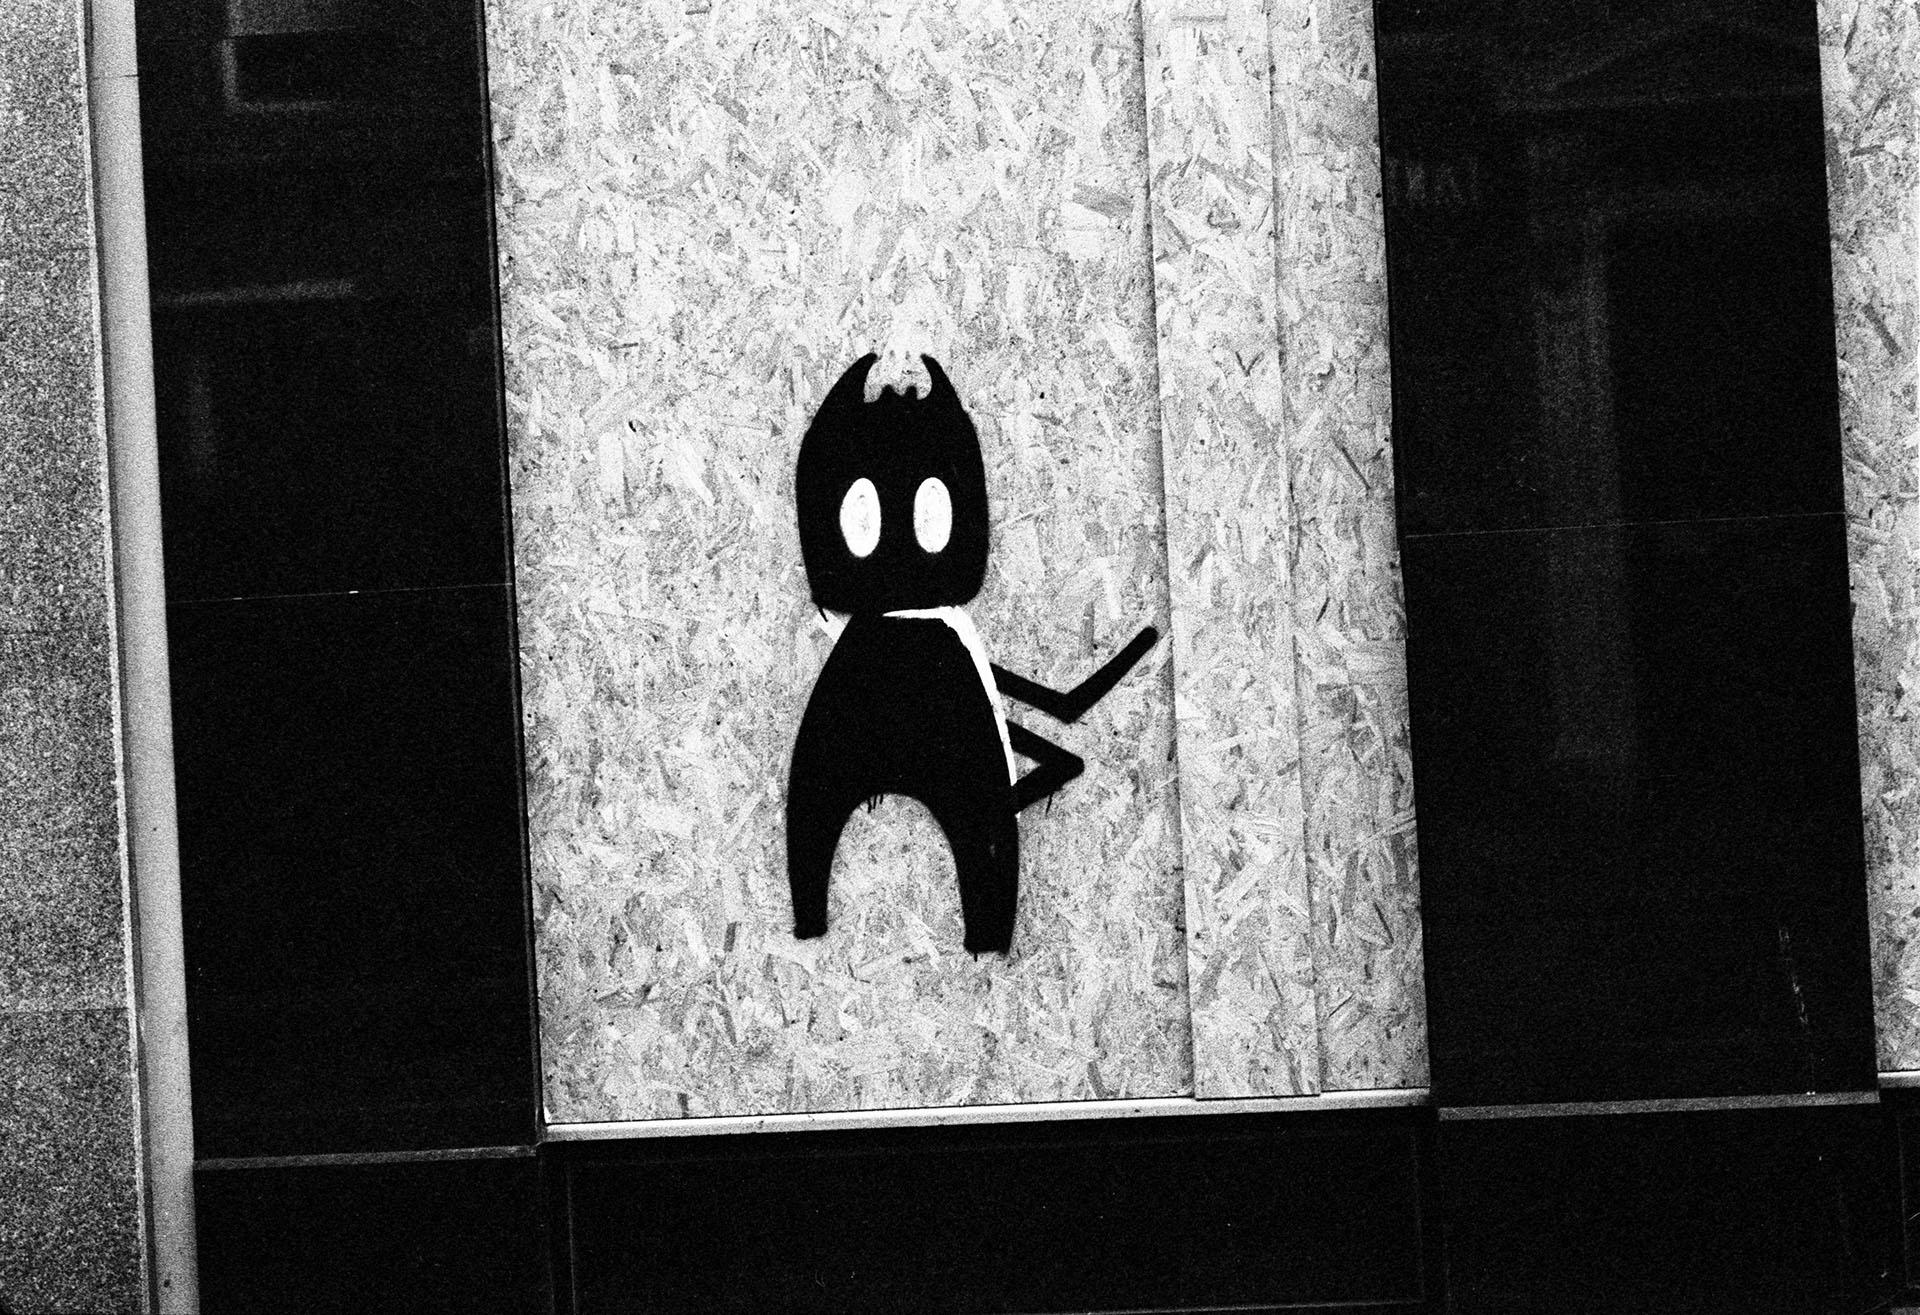 Glasgow street art 35mm